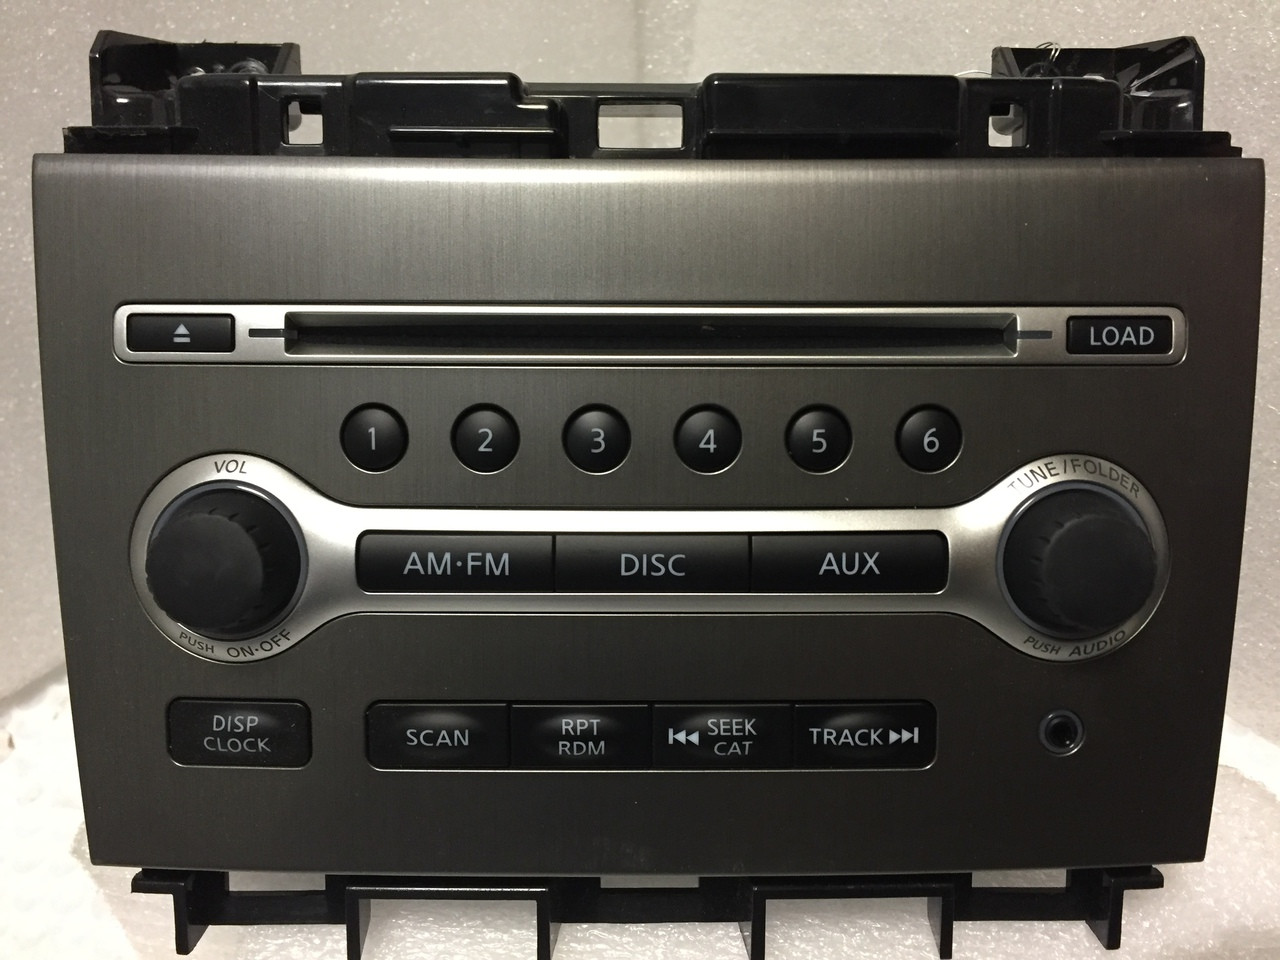 medium resolution of new 12 14 nissan maxima radio 6 disc changer cd mp3 player 12 13 14 cd4car